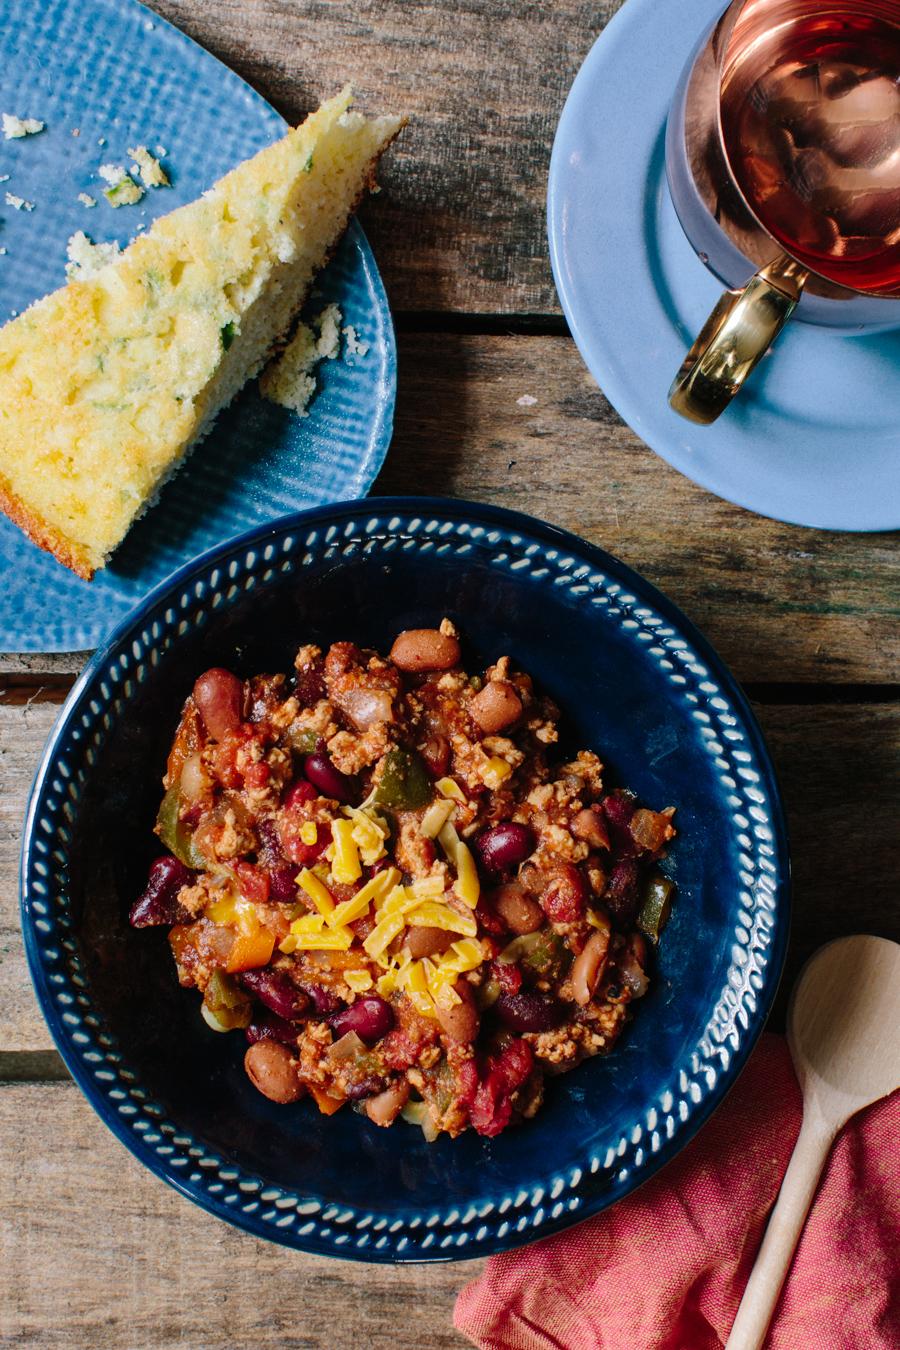 Southern Food Photographer-1.jpg